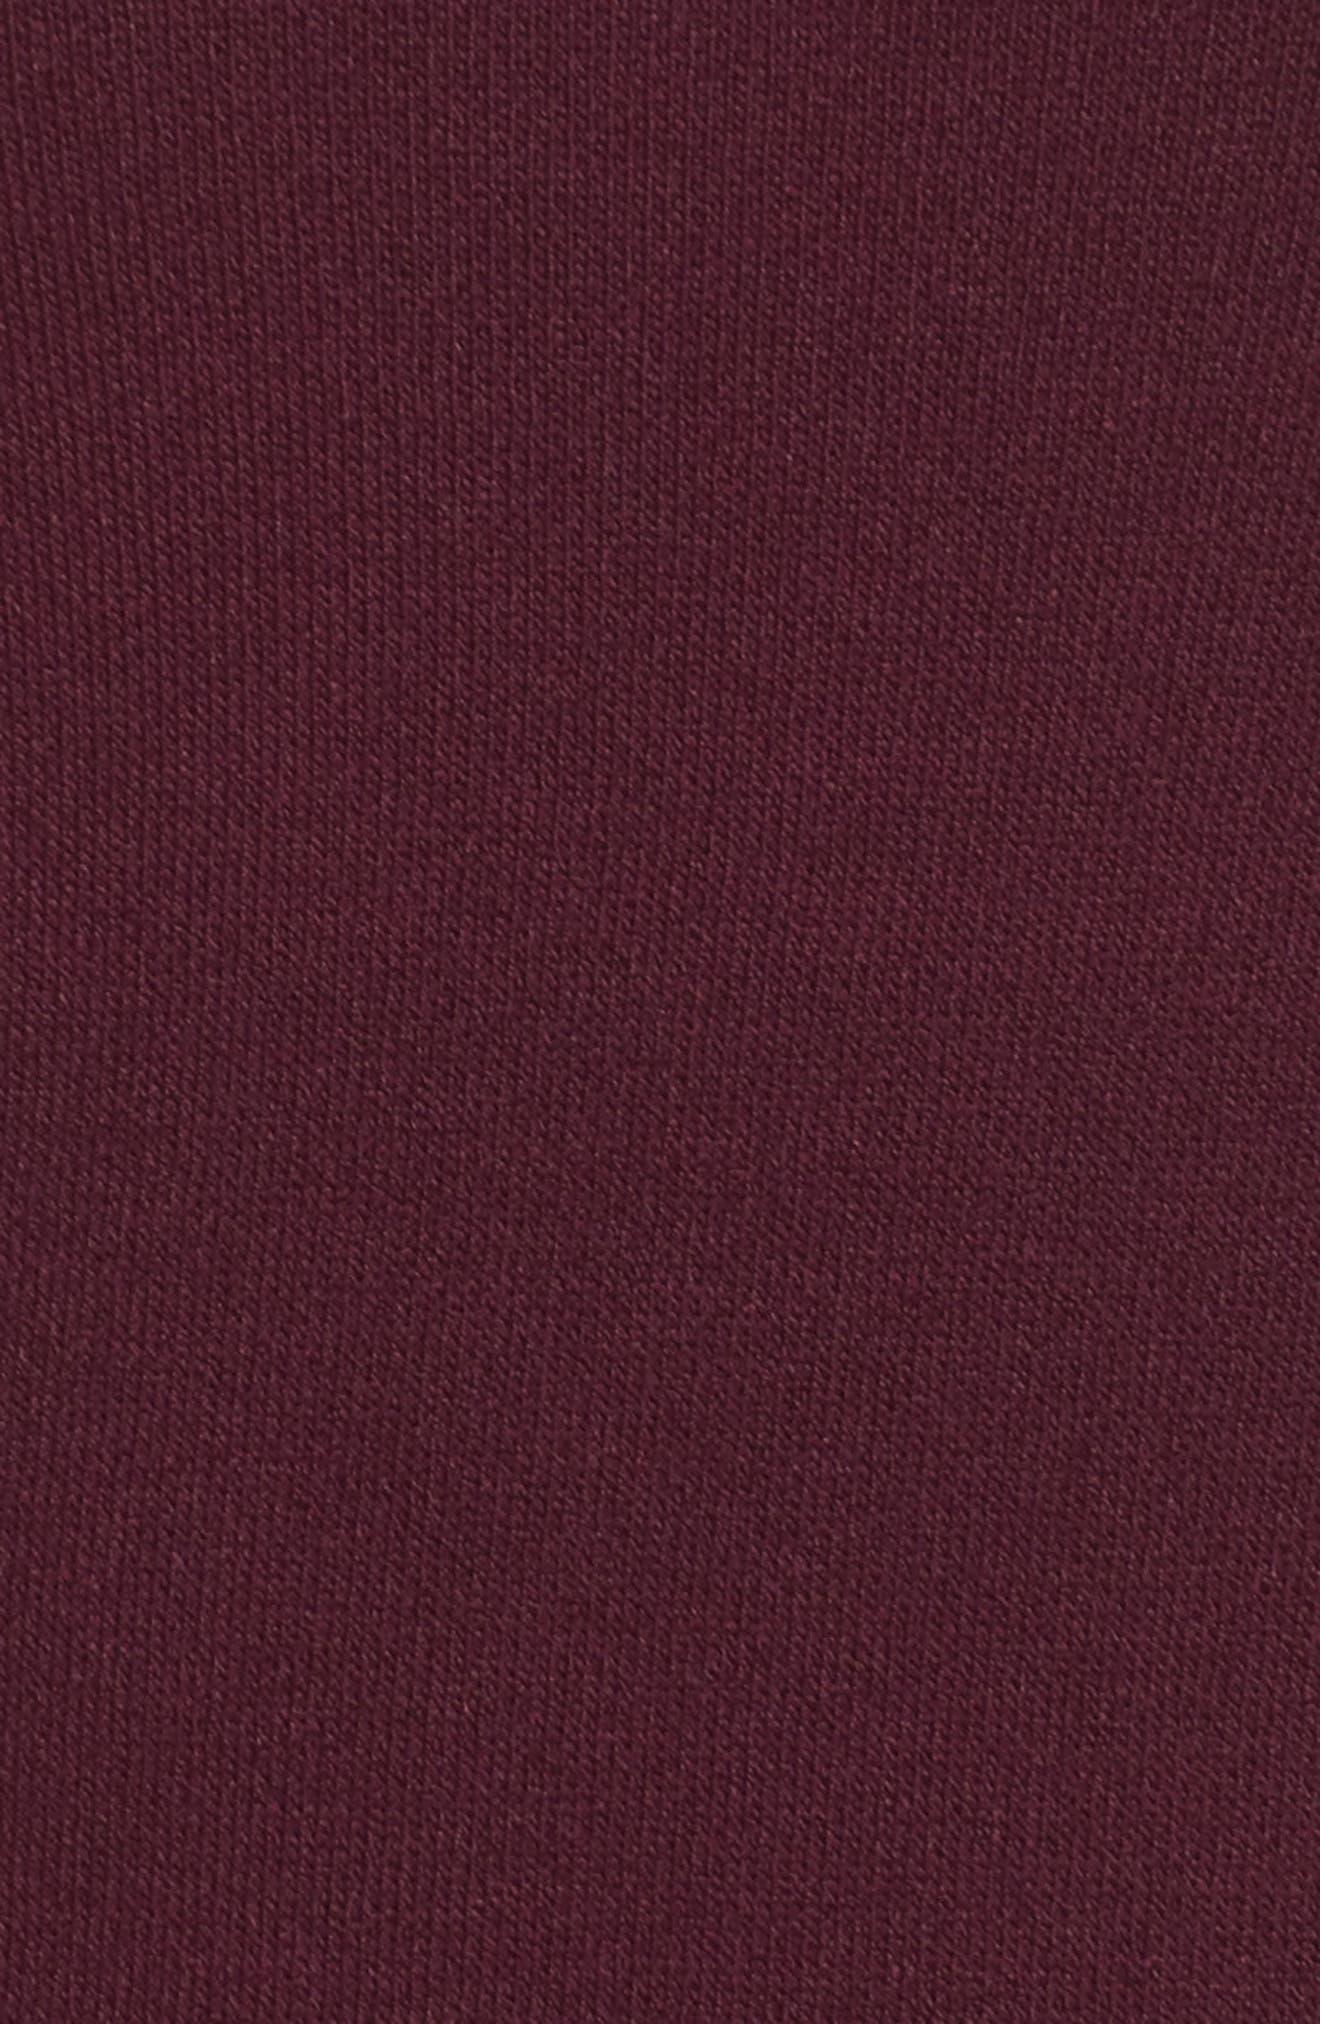 ELIZA J, Cold Shoulder Knit Body-Con Dress, Alternate thumbnail 5, color, 500